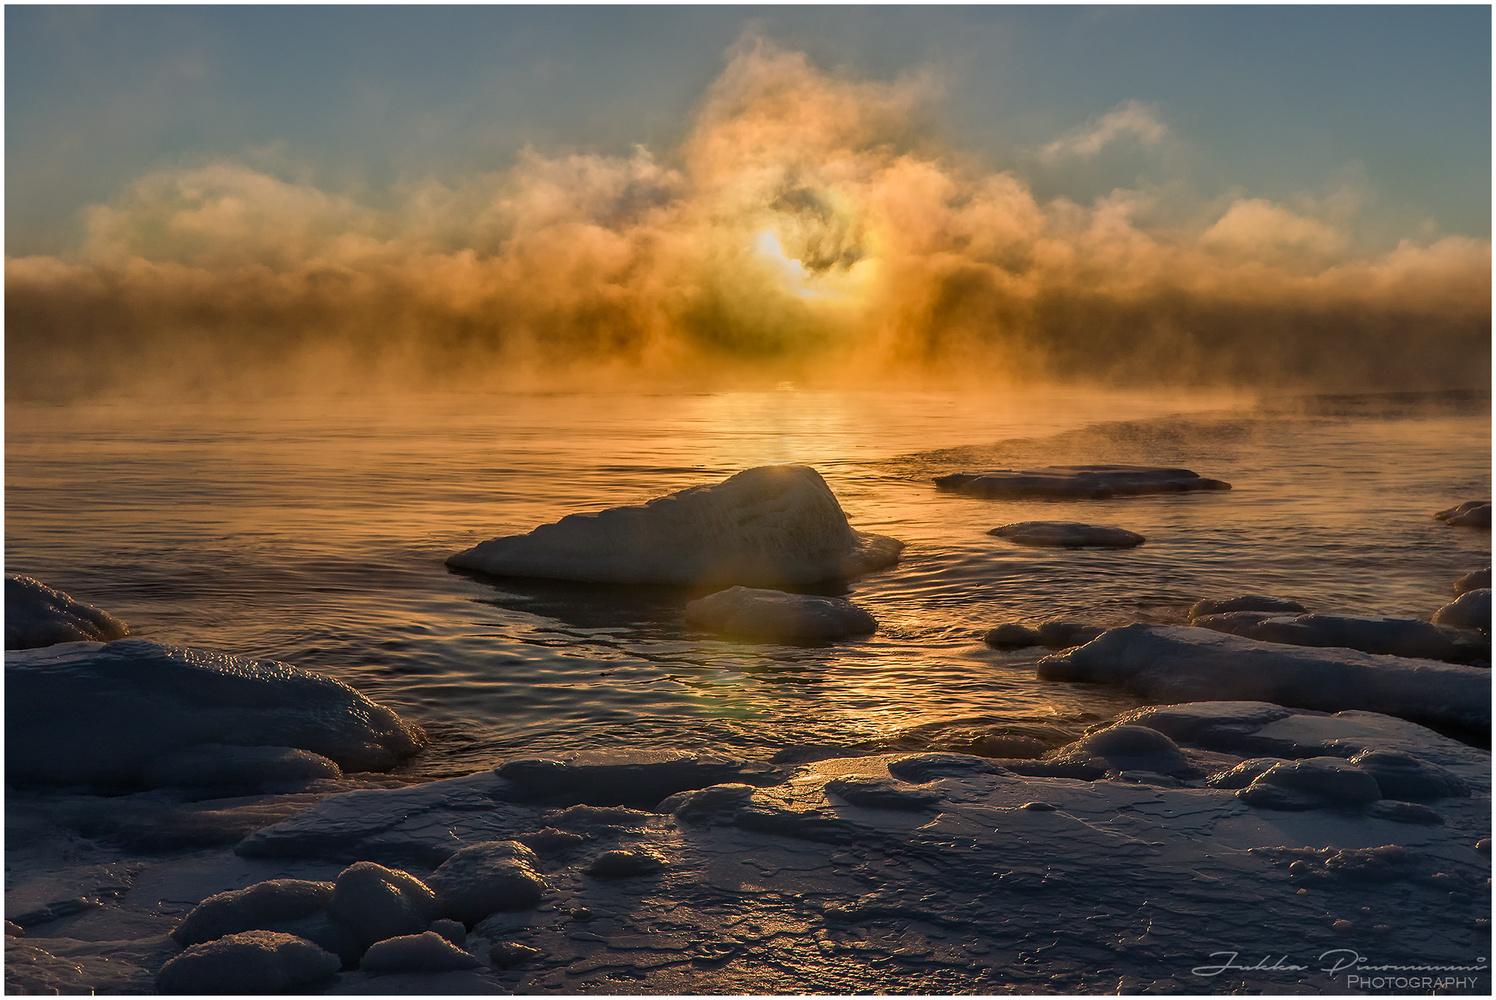 Cold morning by Jukka Pinonummi